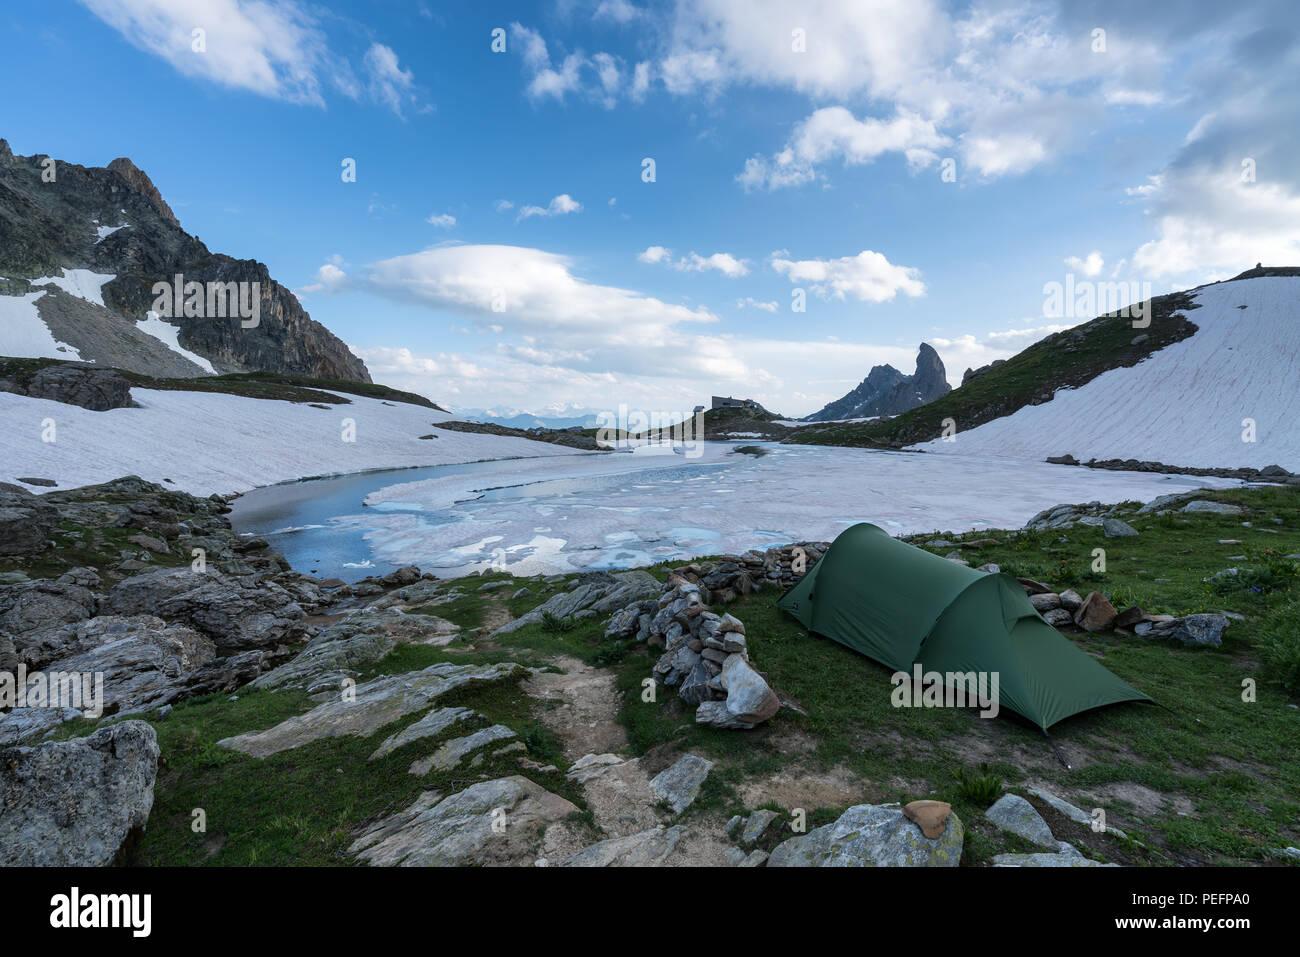 Am Lac de Presset See, Rhône-Alpes, Frankreich, Europa, EU Stockbild